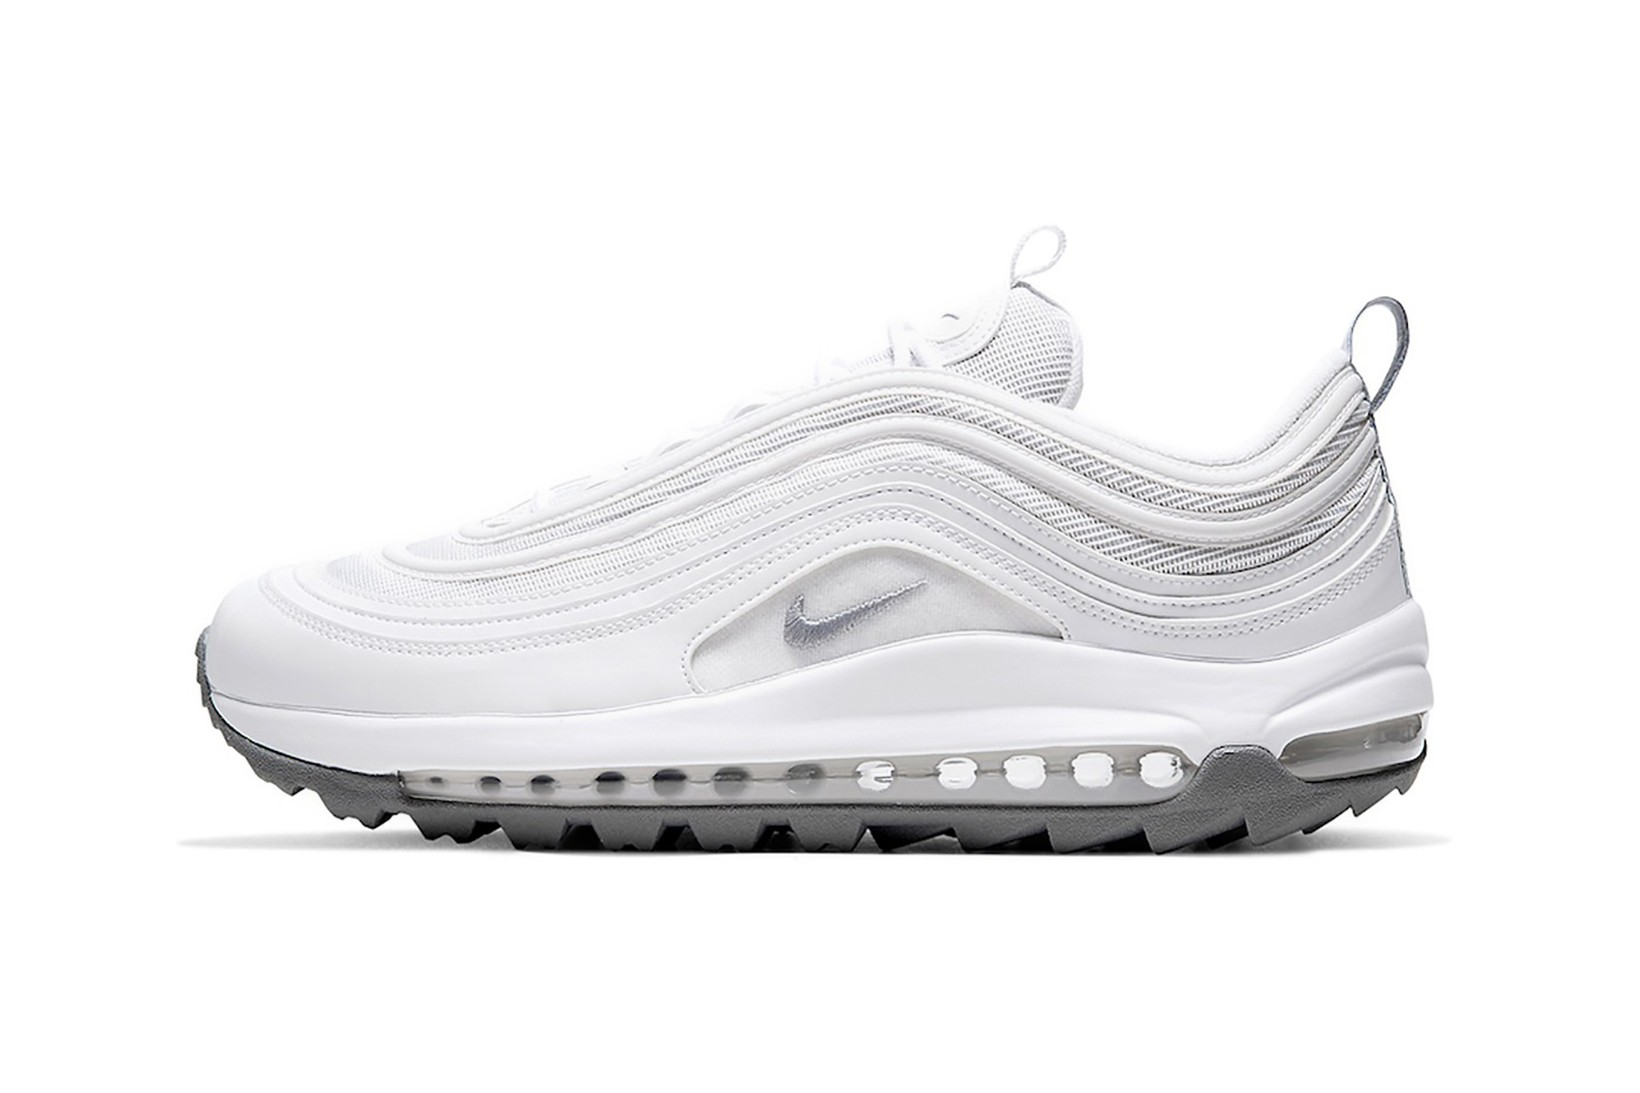 Nike Golf Air Max 97 G Sneakers White